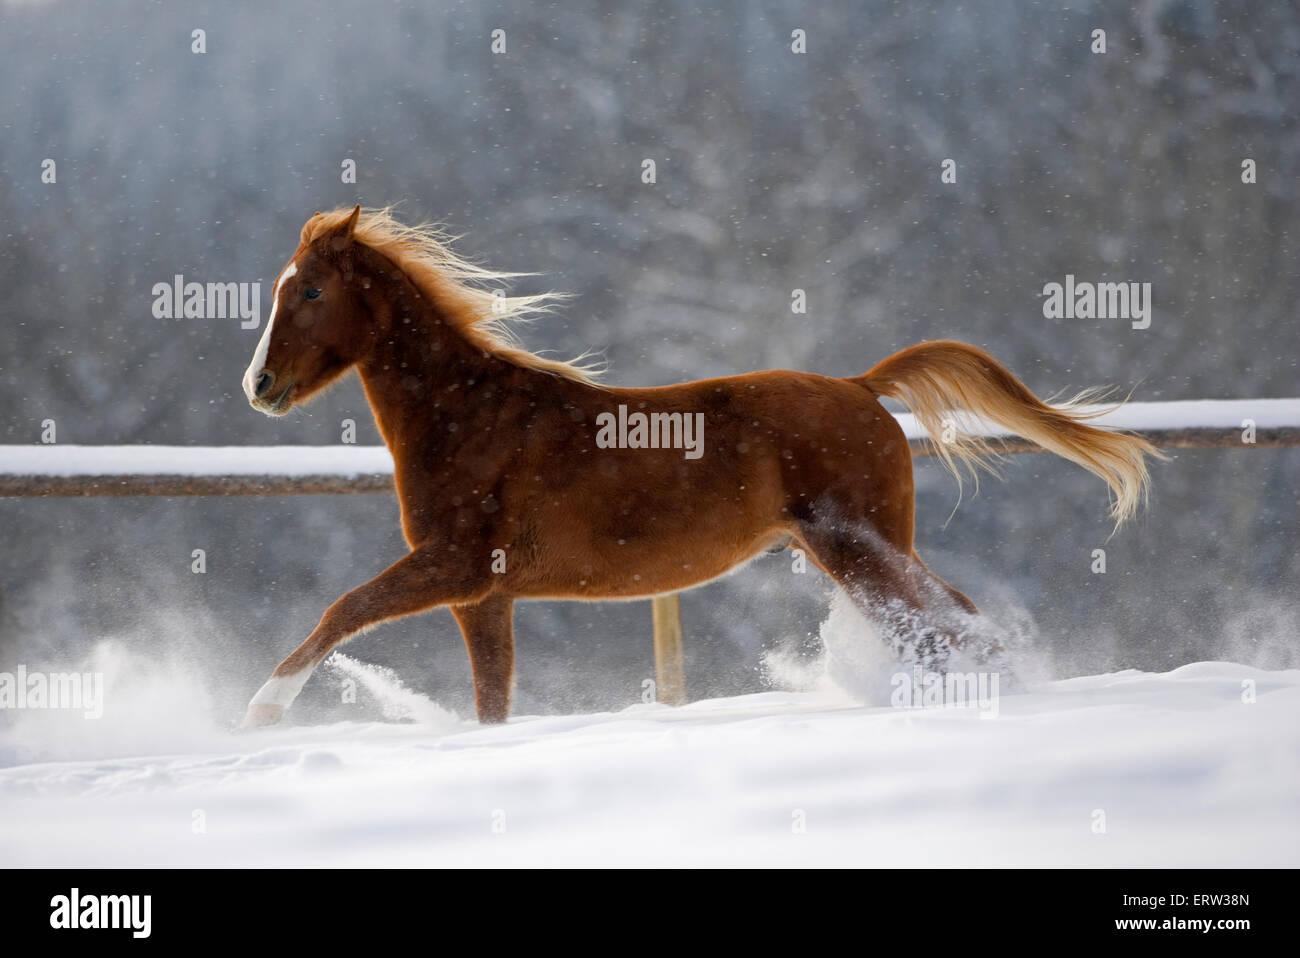 Arabian Horse trotting in snow at winter pasture - Stock Image